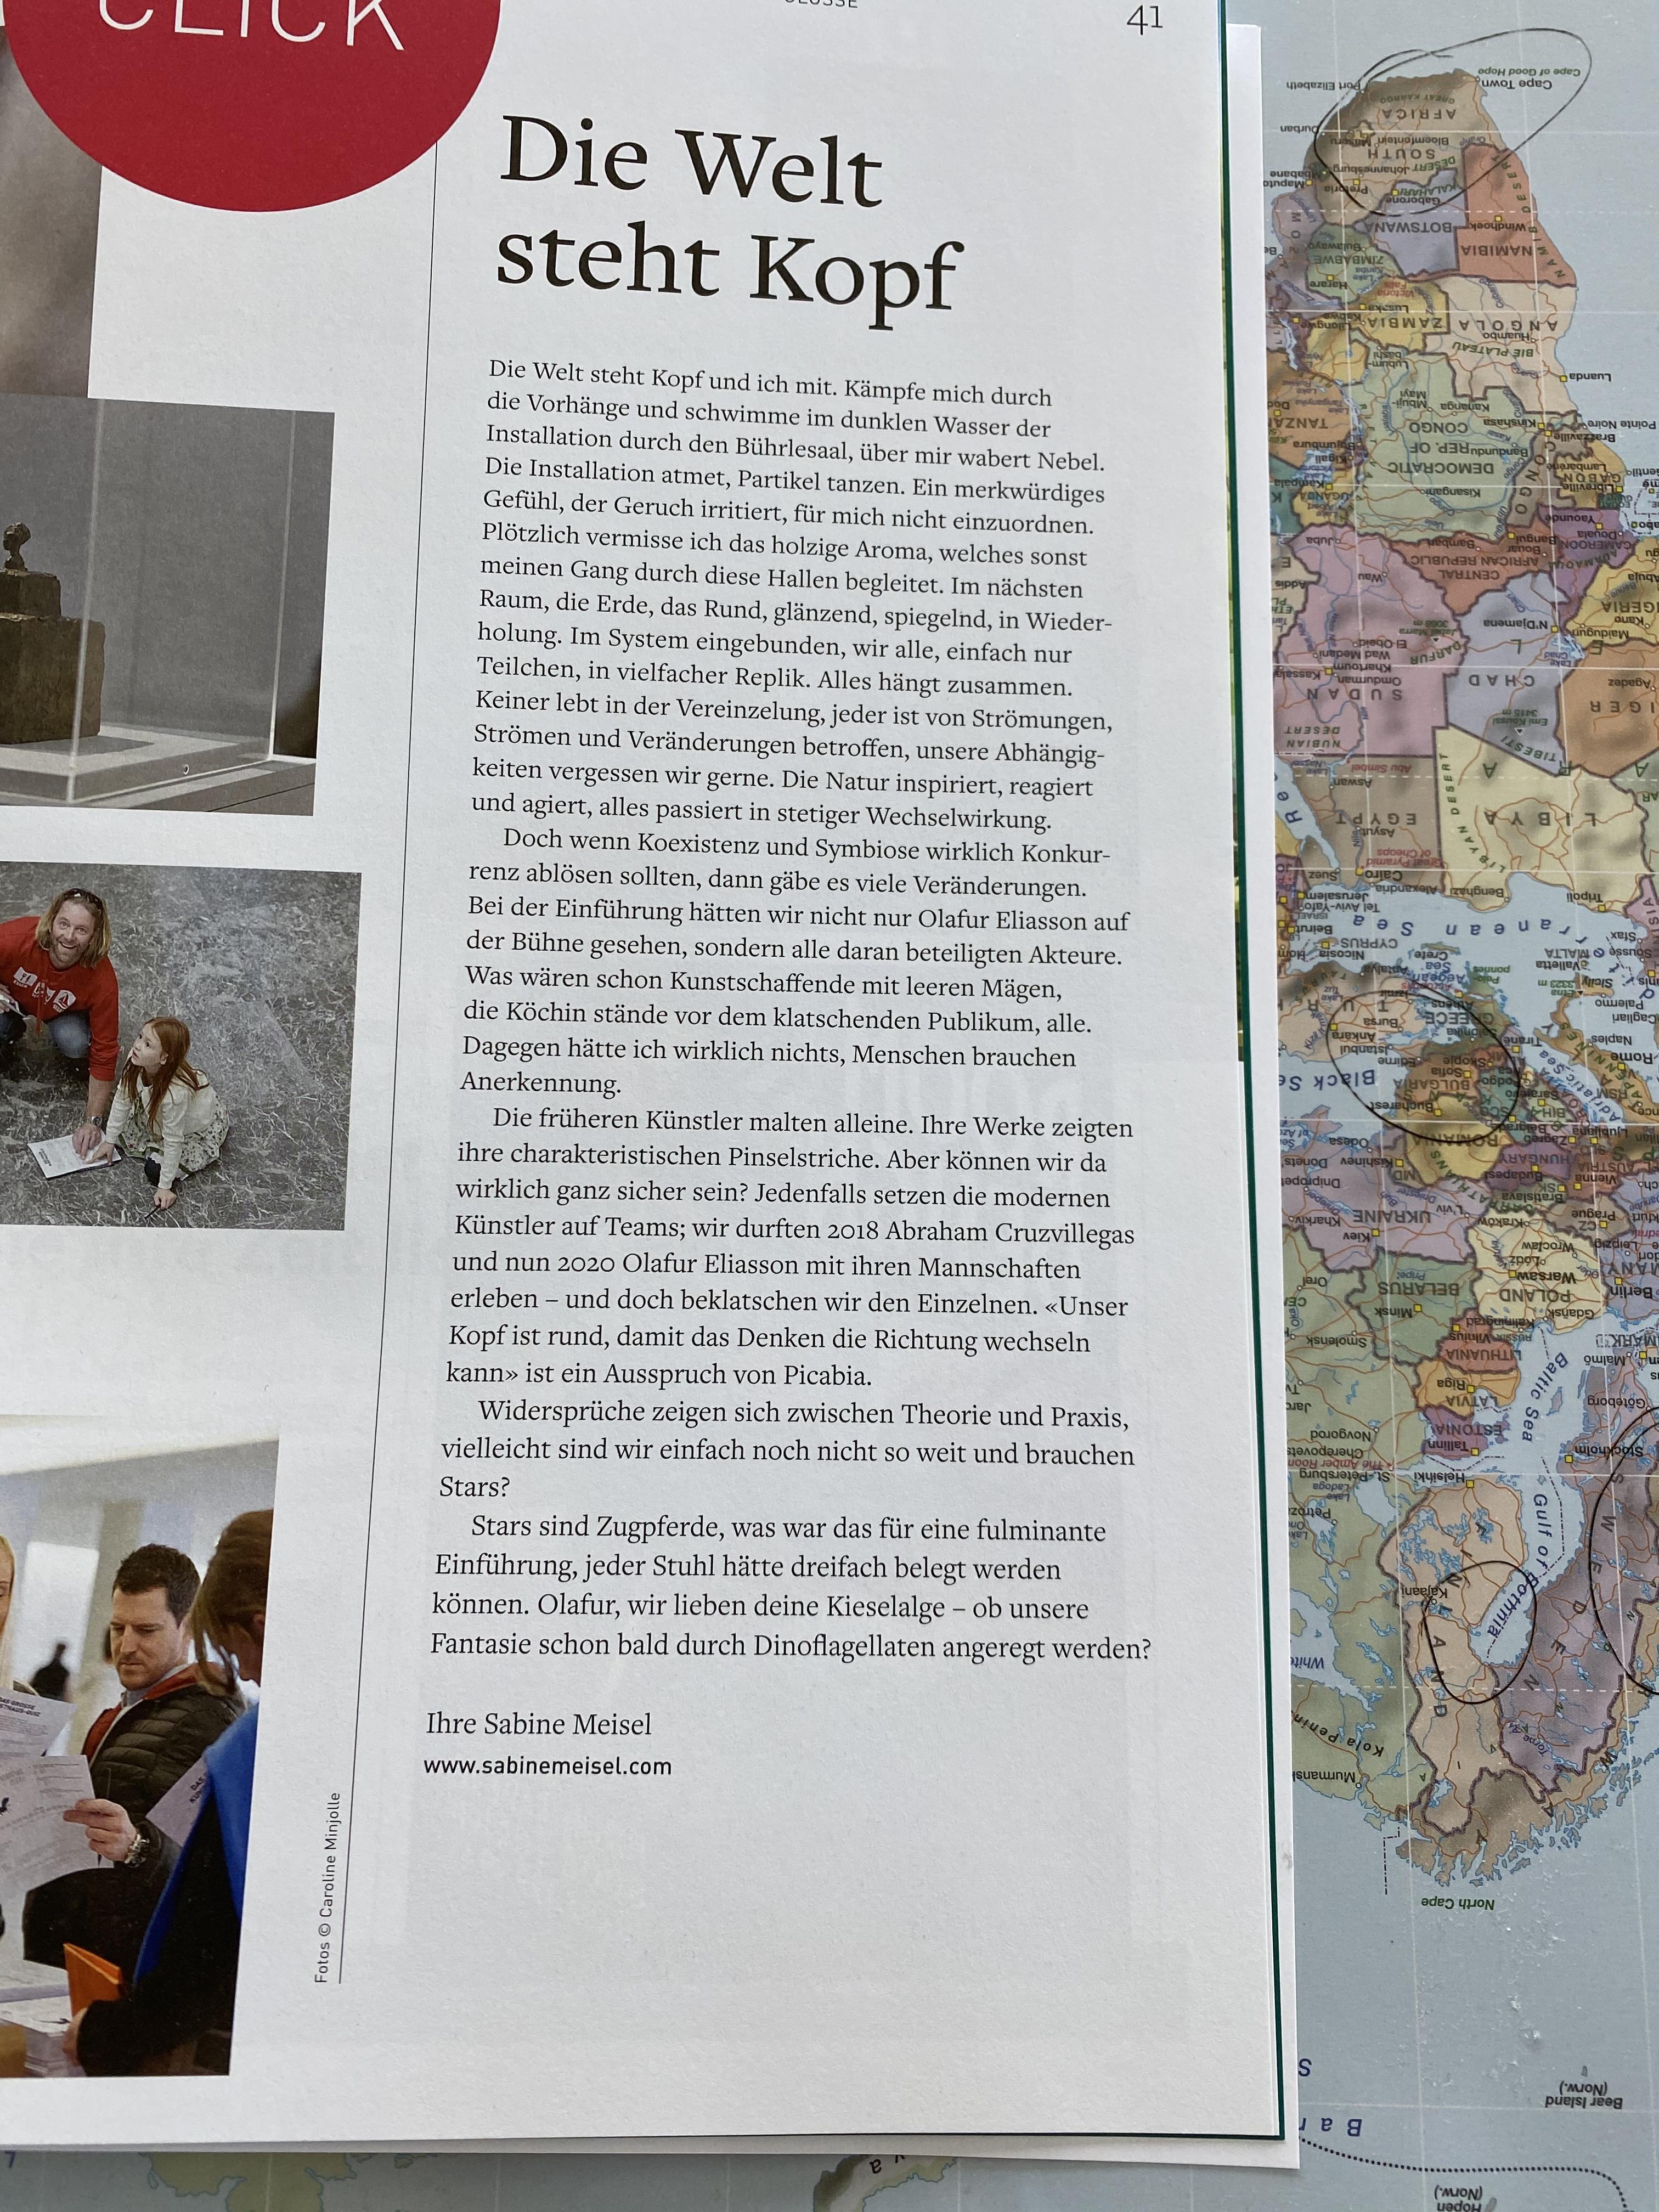 kunsthaus text 2.jpg